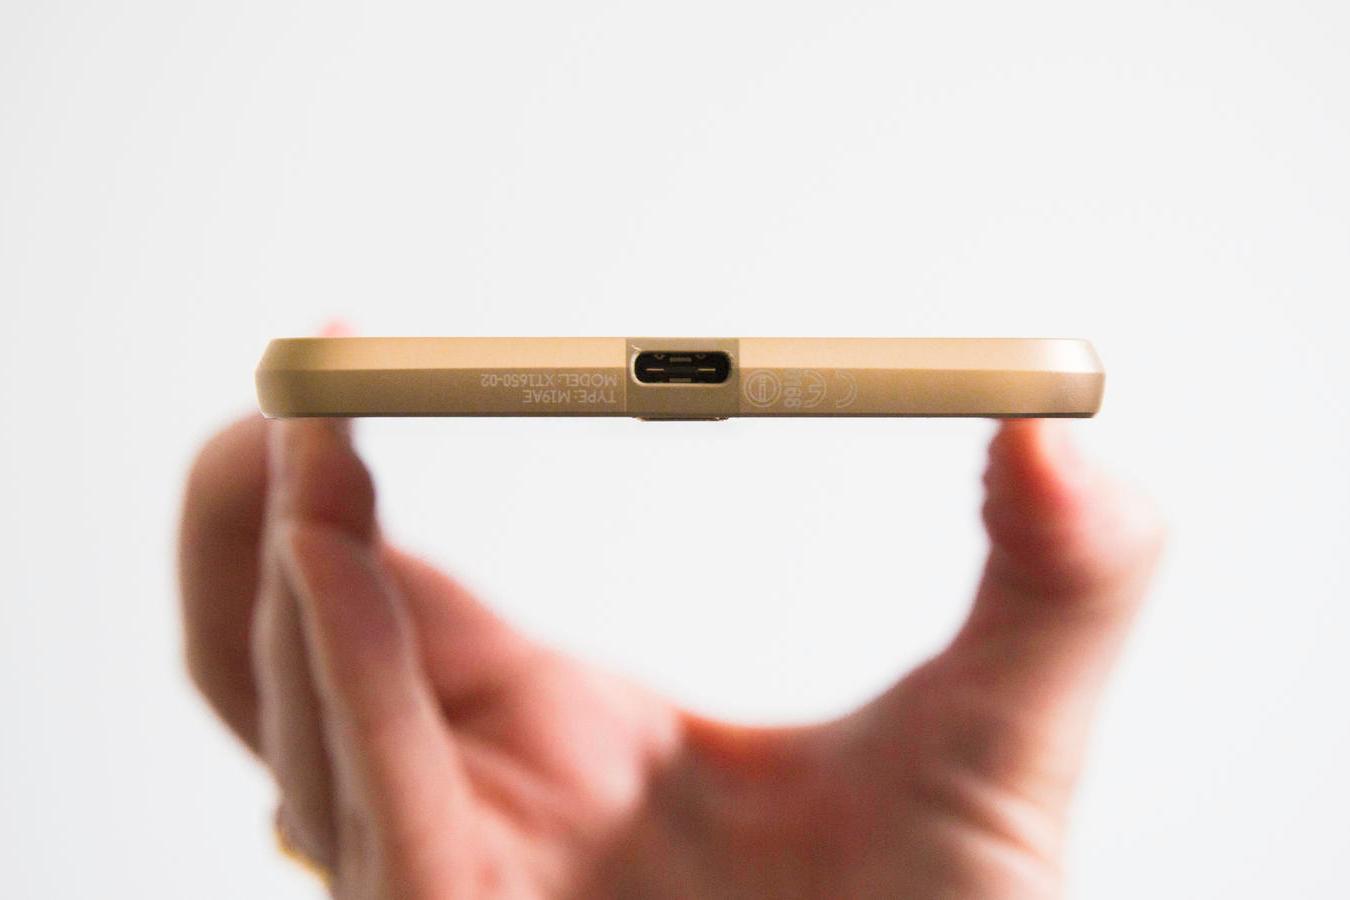 Motorola's 2016 Flagship Phone to Completely Remove the Headphone Jack